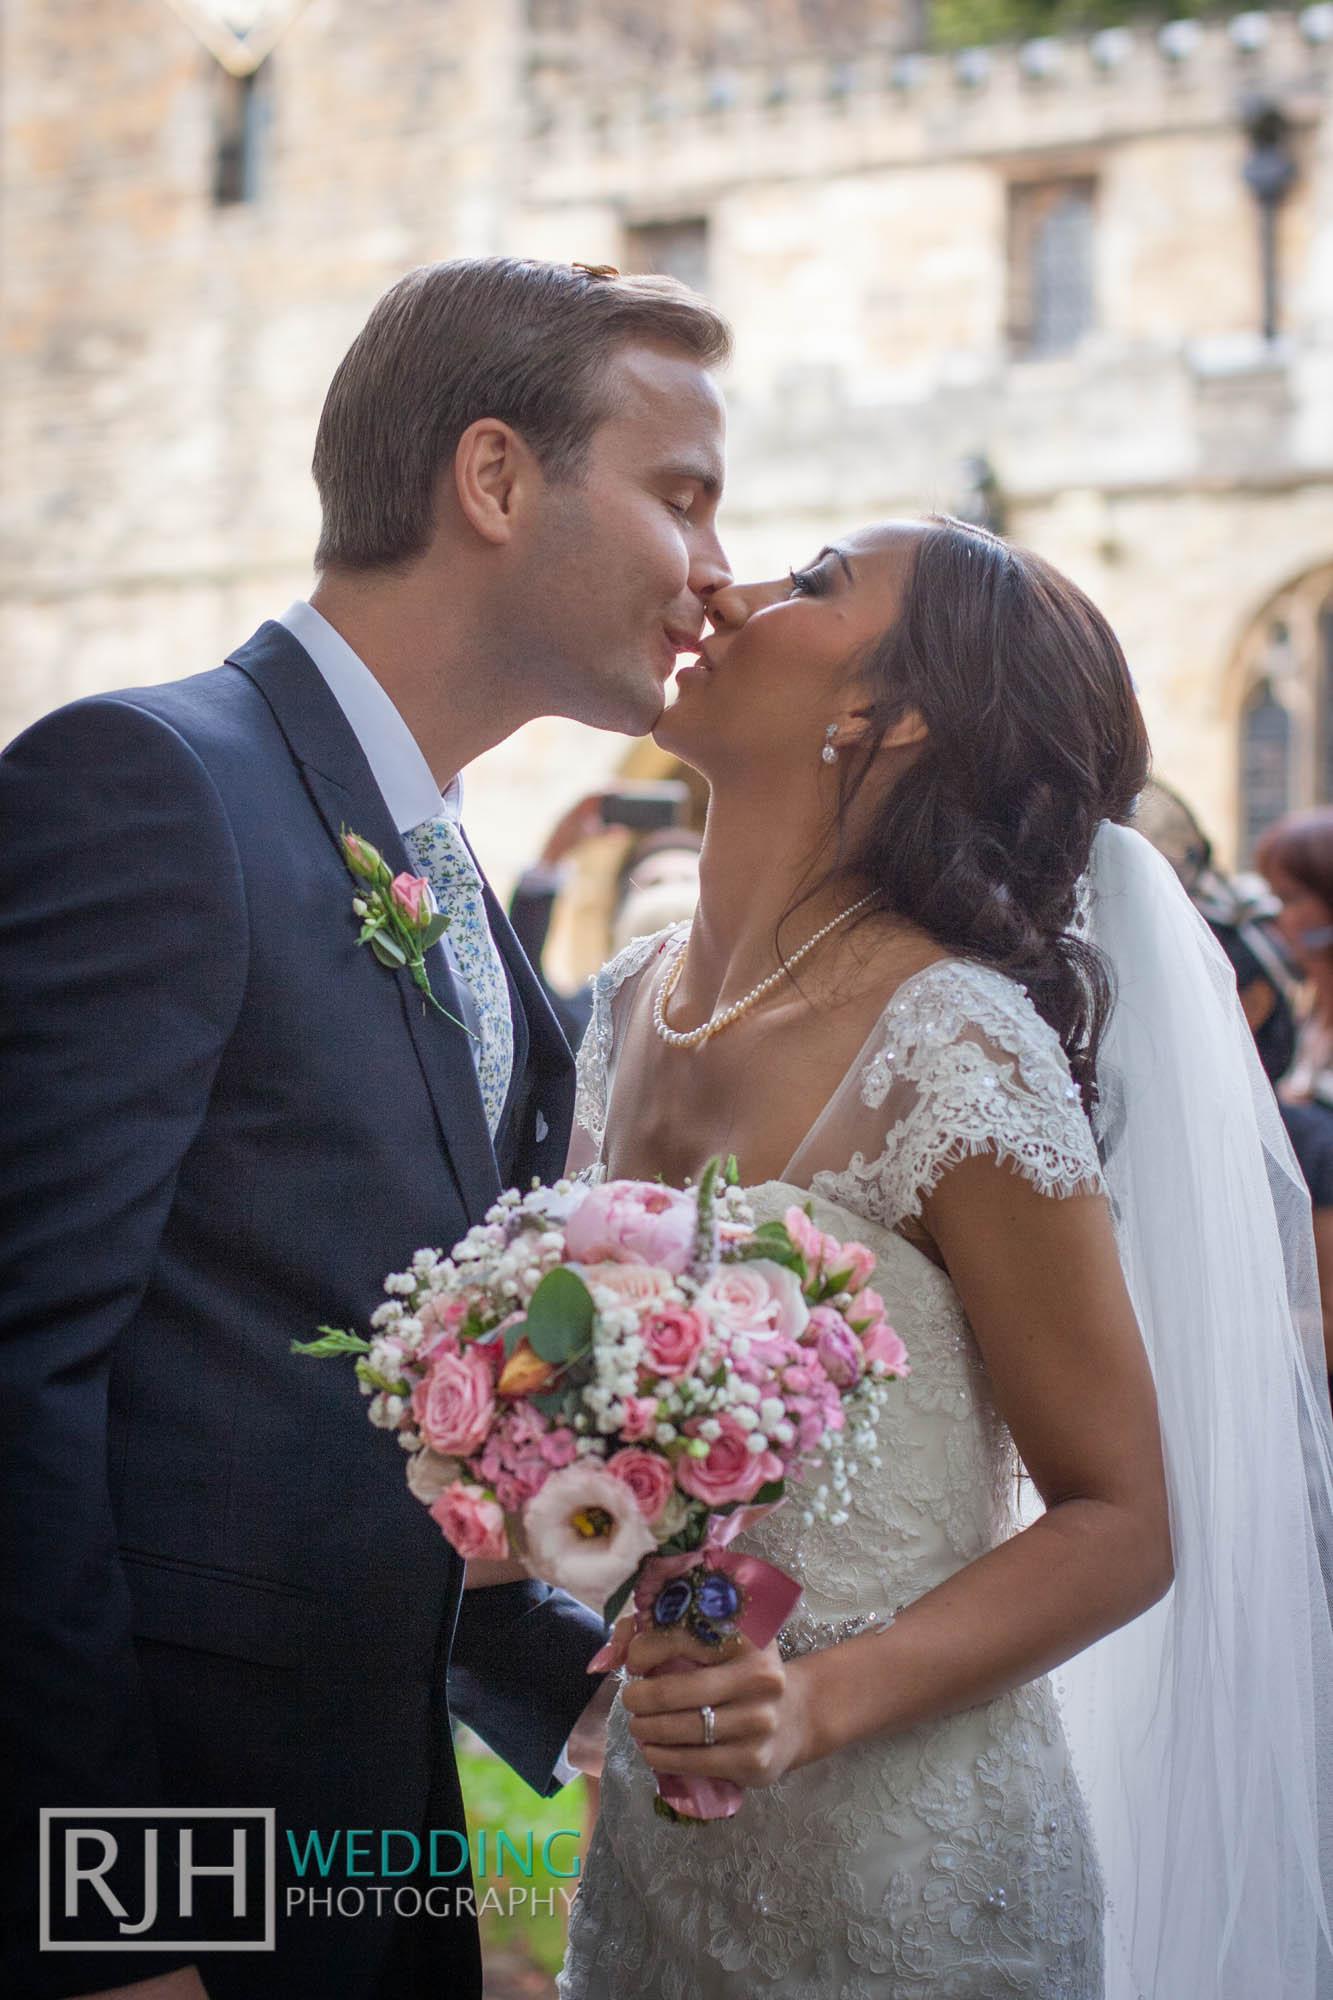 RJH Wedding Photography_Tankersley Manor Wedding_30.jpg